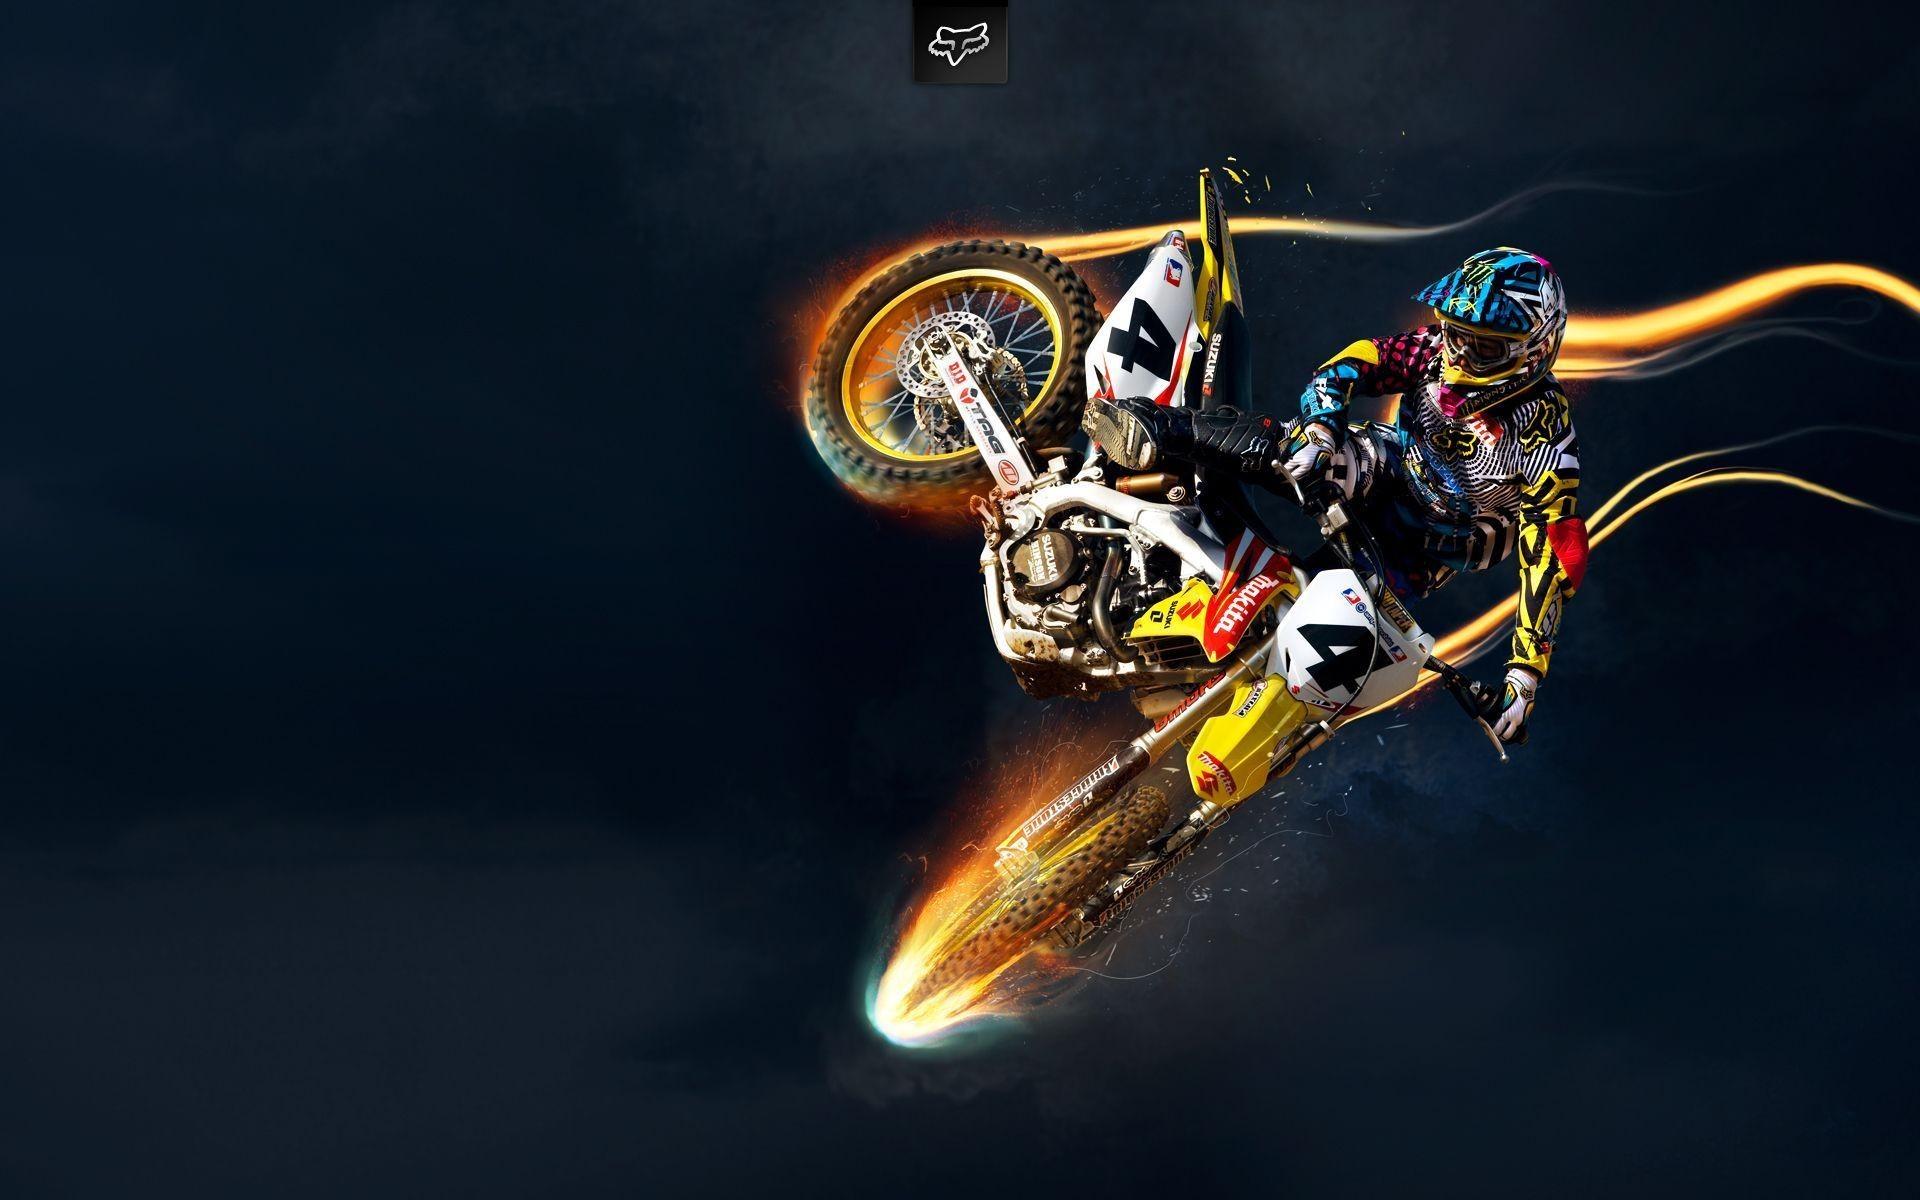 Motocross · Suzuki Motocross Wallpapers | HD Wallpapers